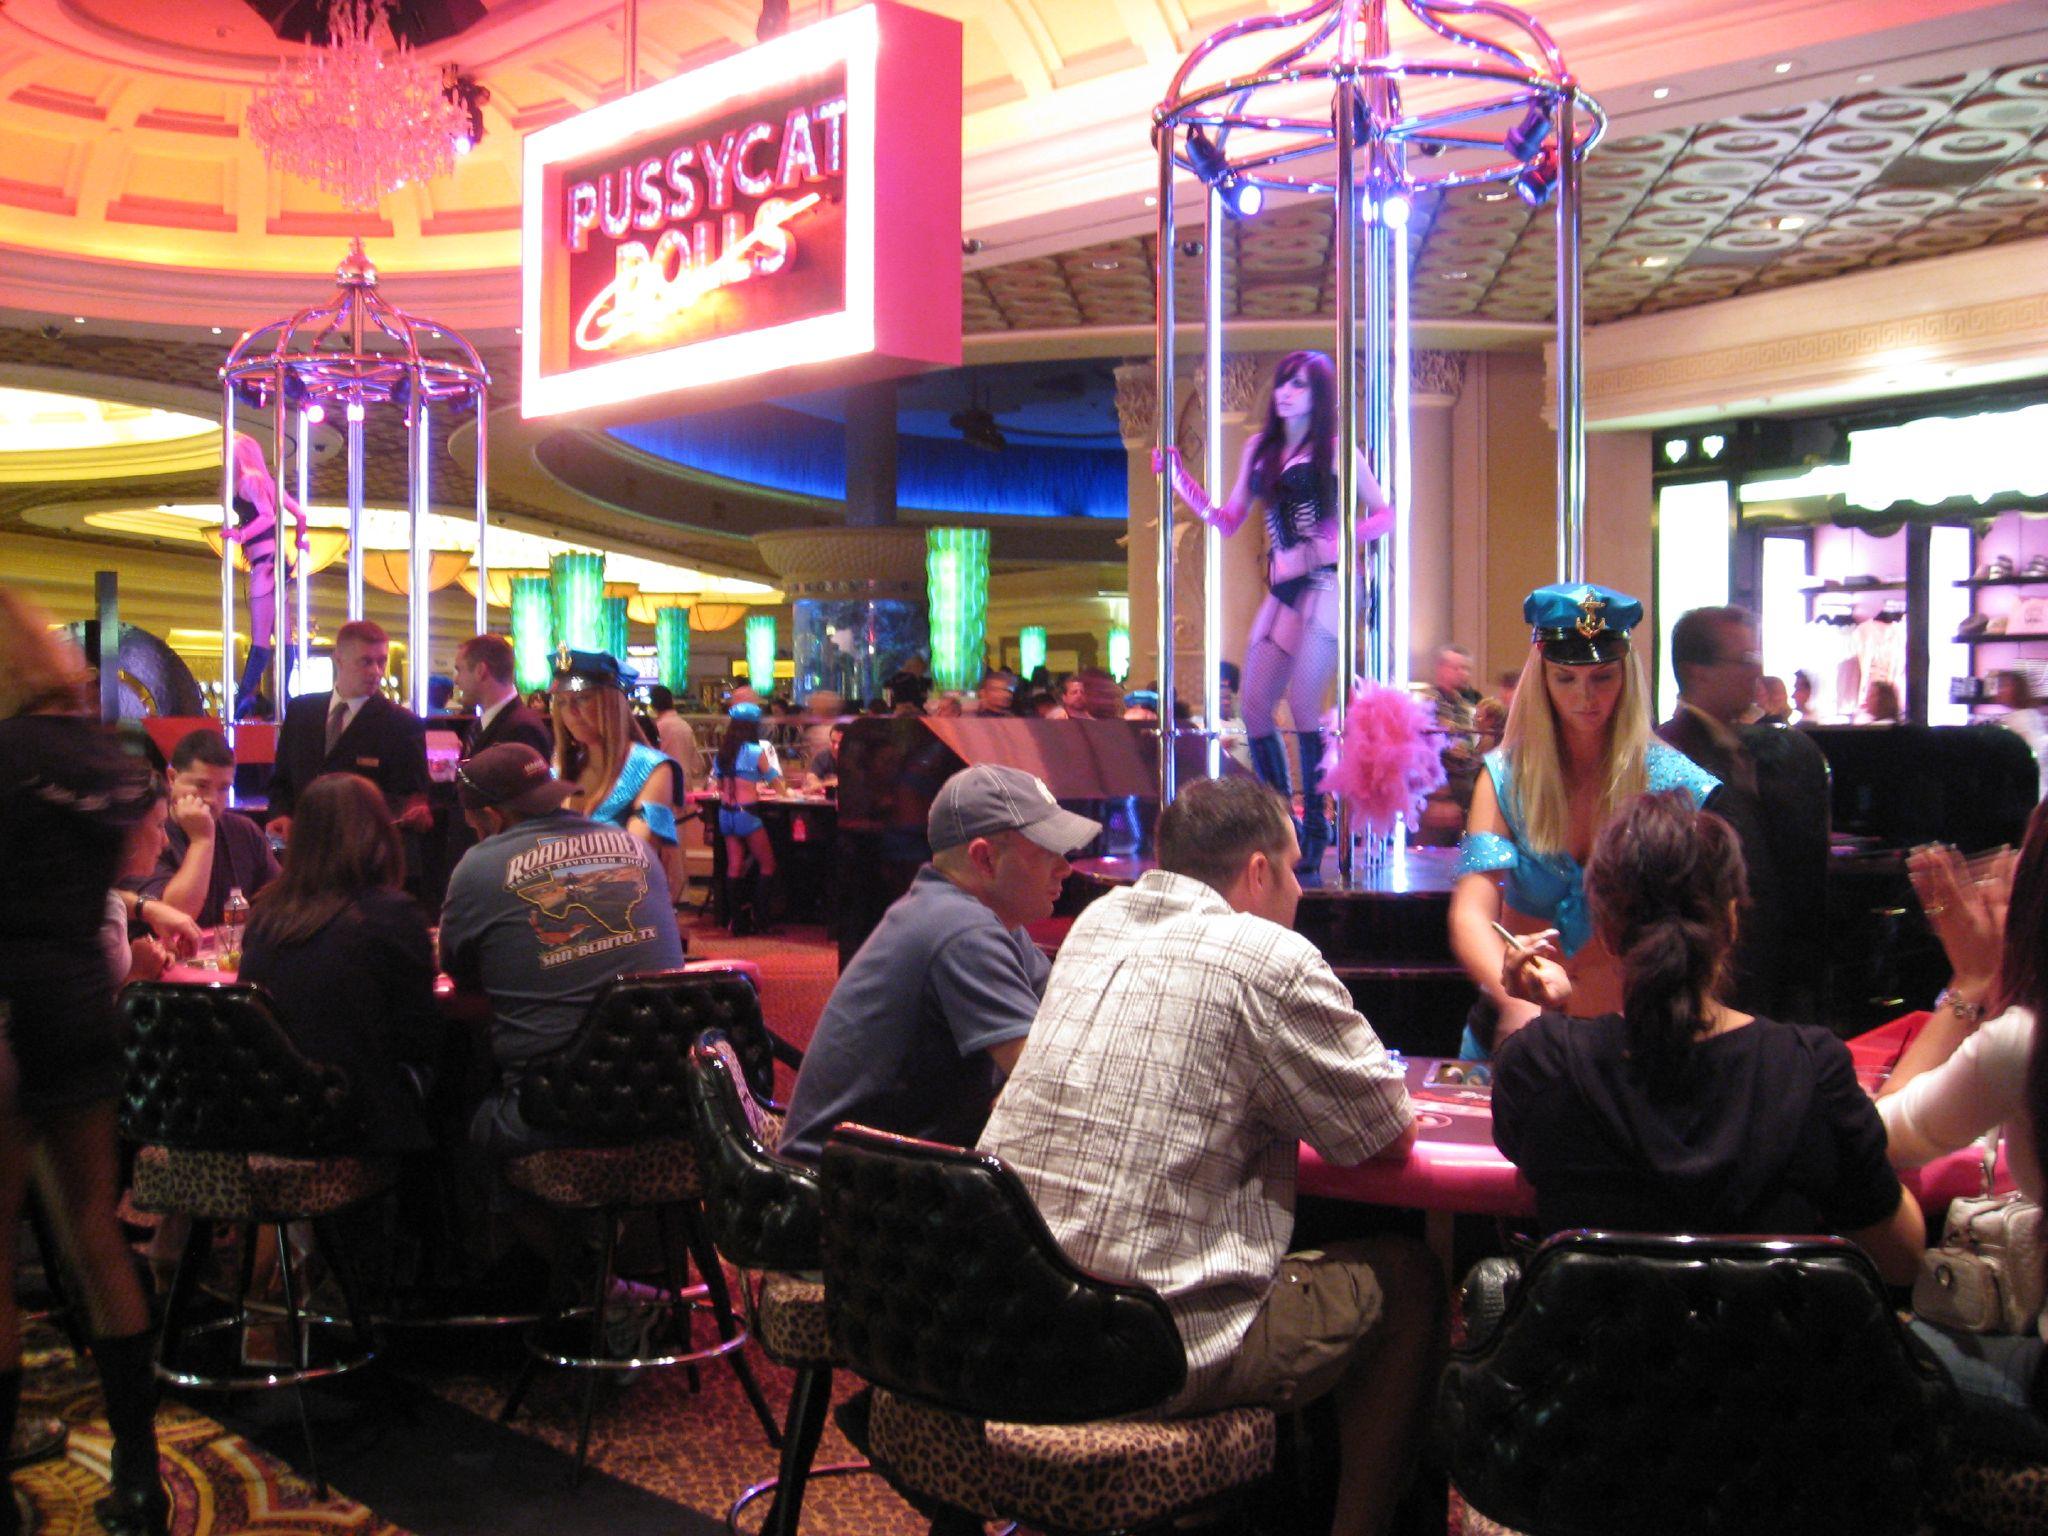 Pussycat_Dolls_Casino